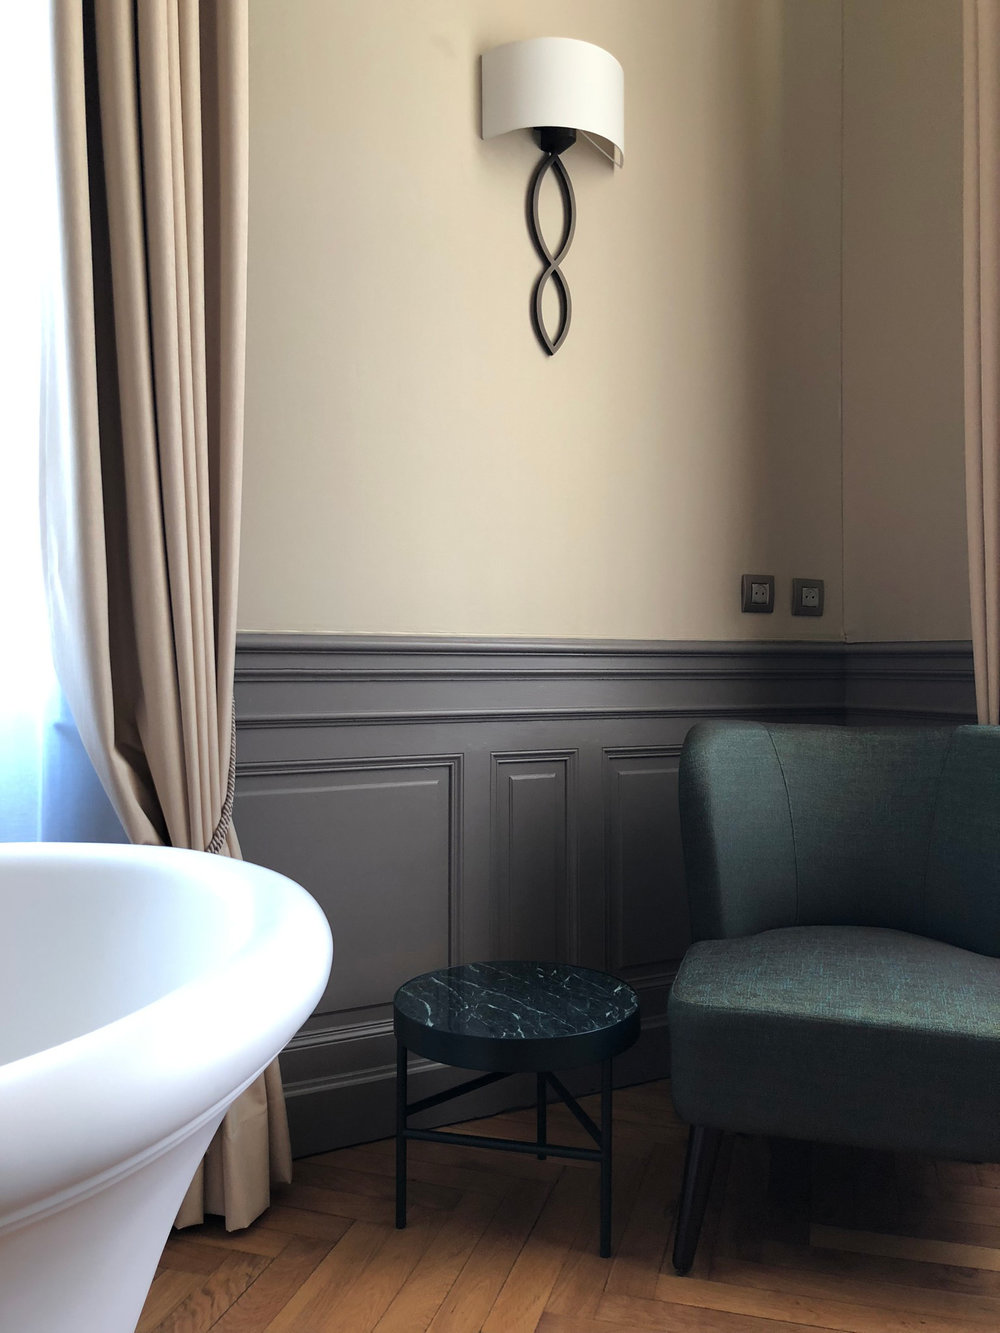 iria degen interiors chateau-de-montcaud france_08.jpg